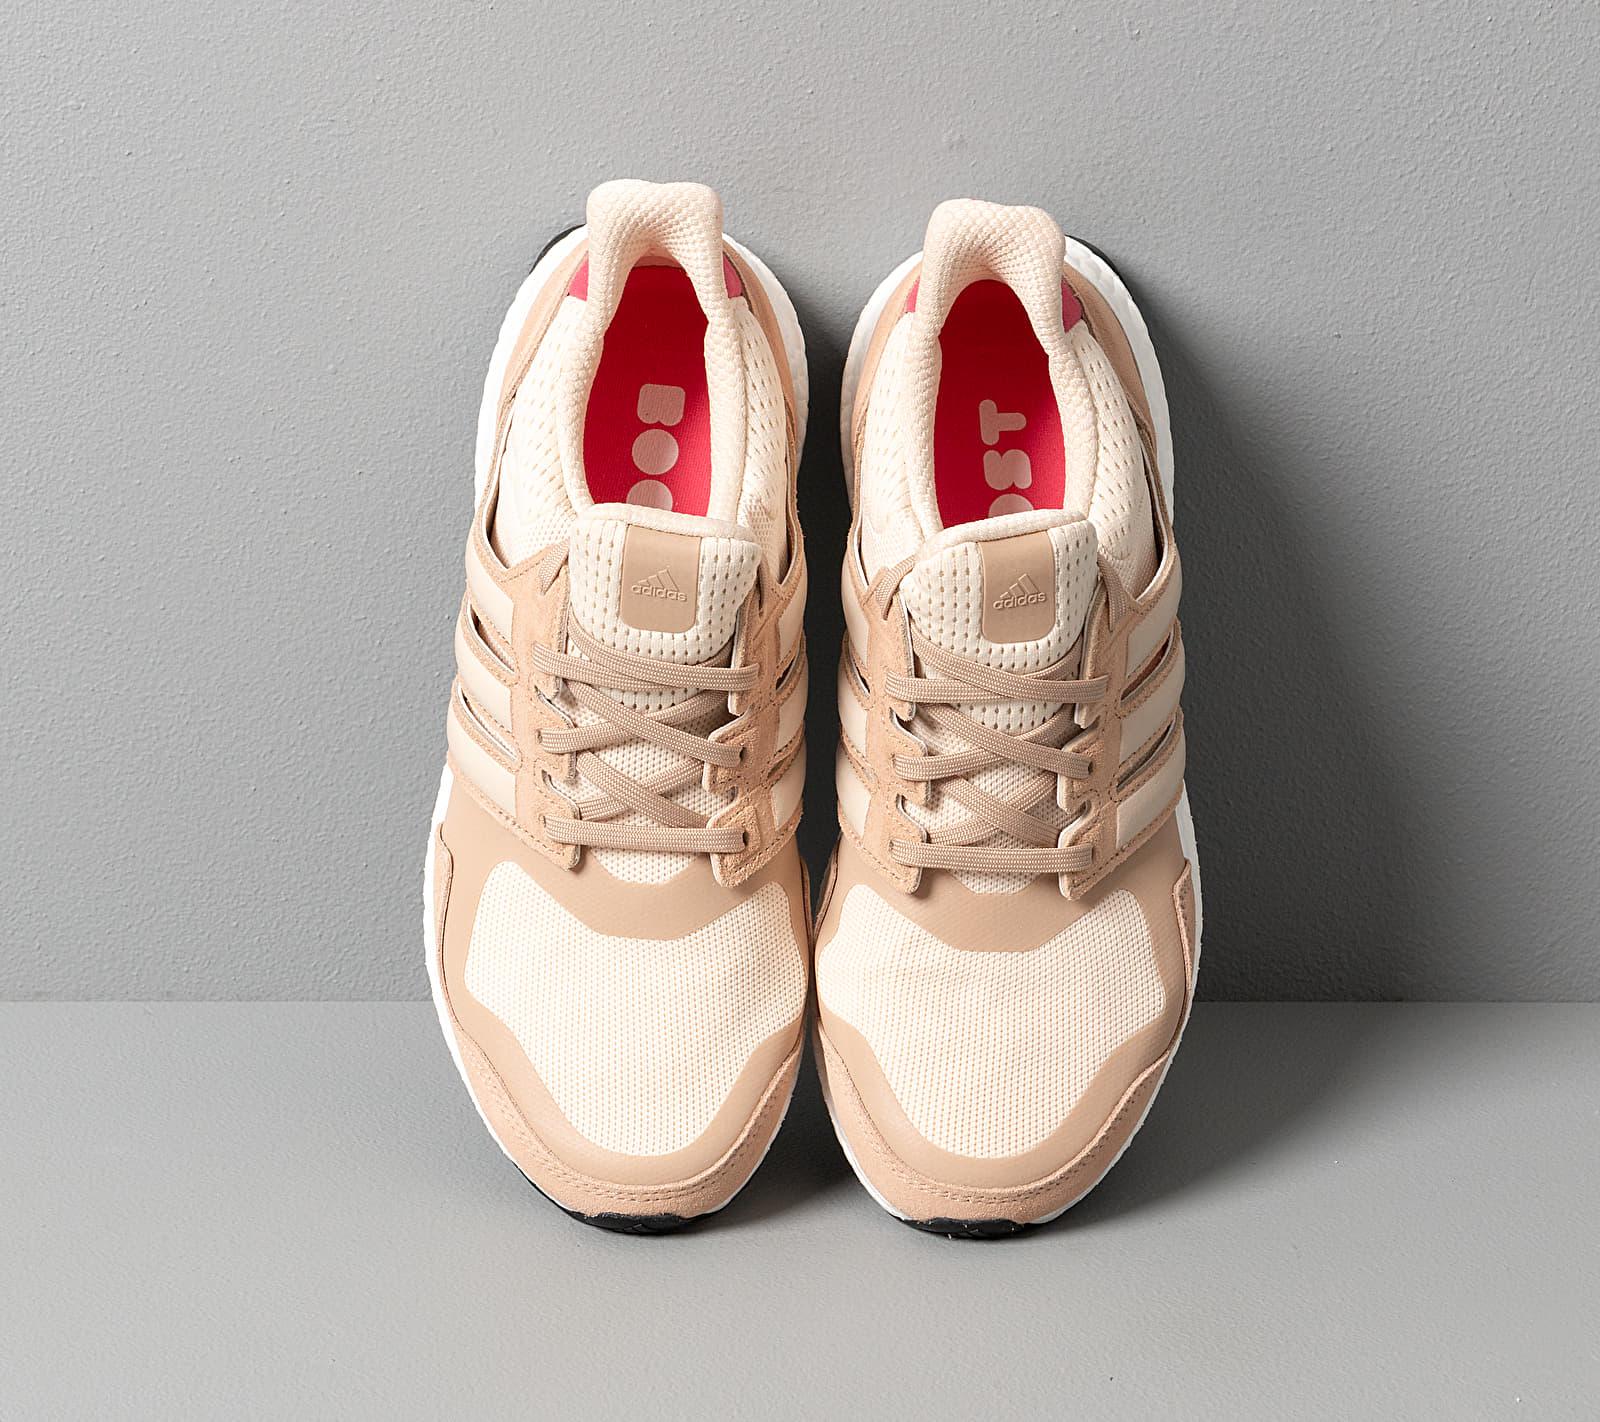 adidas UltraBOOST S&L W Ecru Tint/ St Pale Nude/ Real Pink, Brown